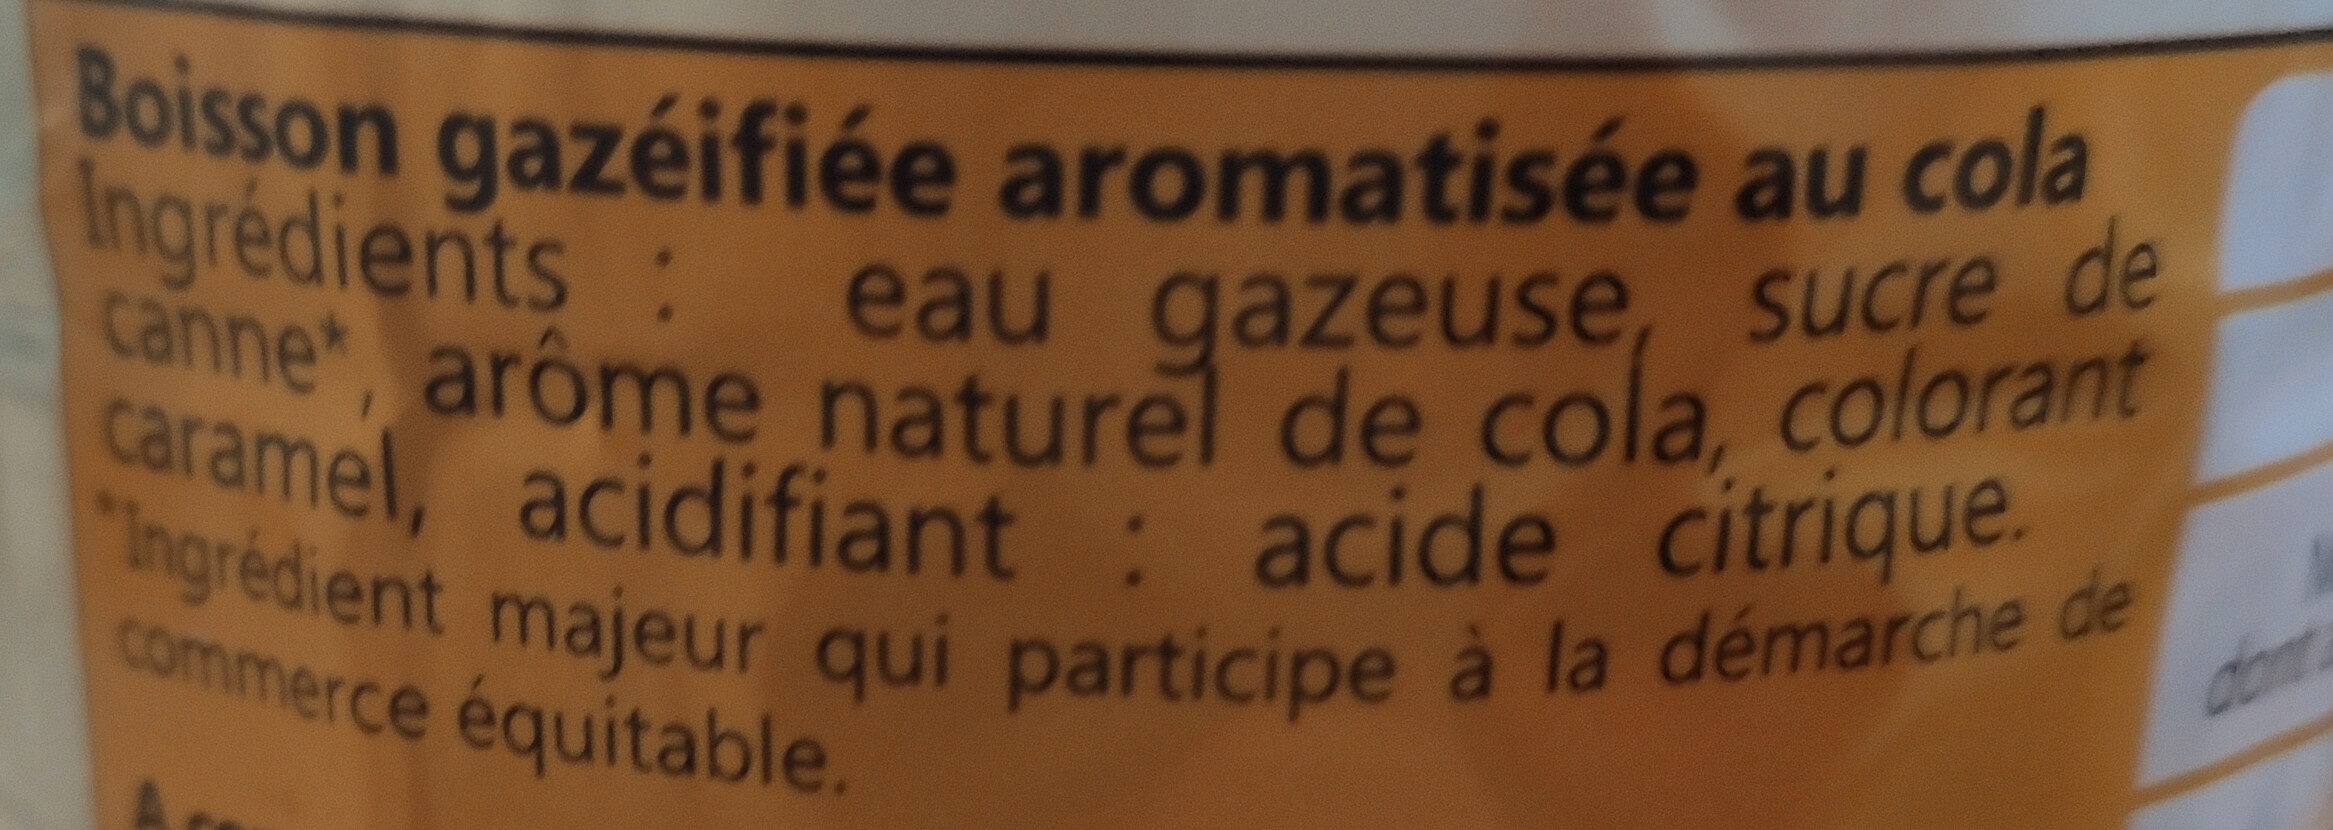 Meuh Cola - Ingrédients - fr